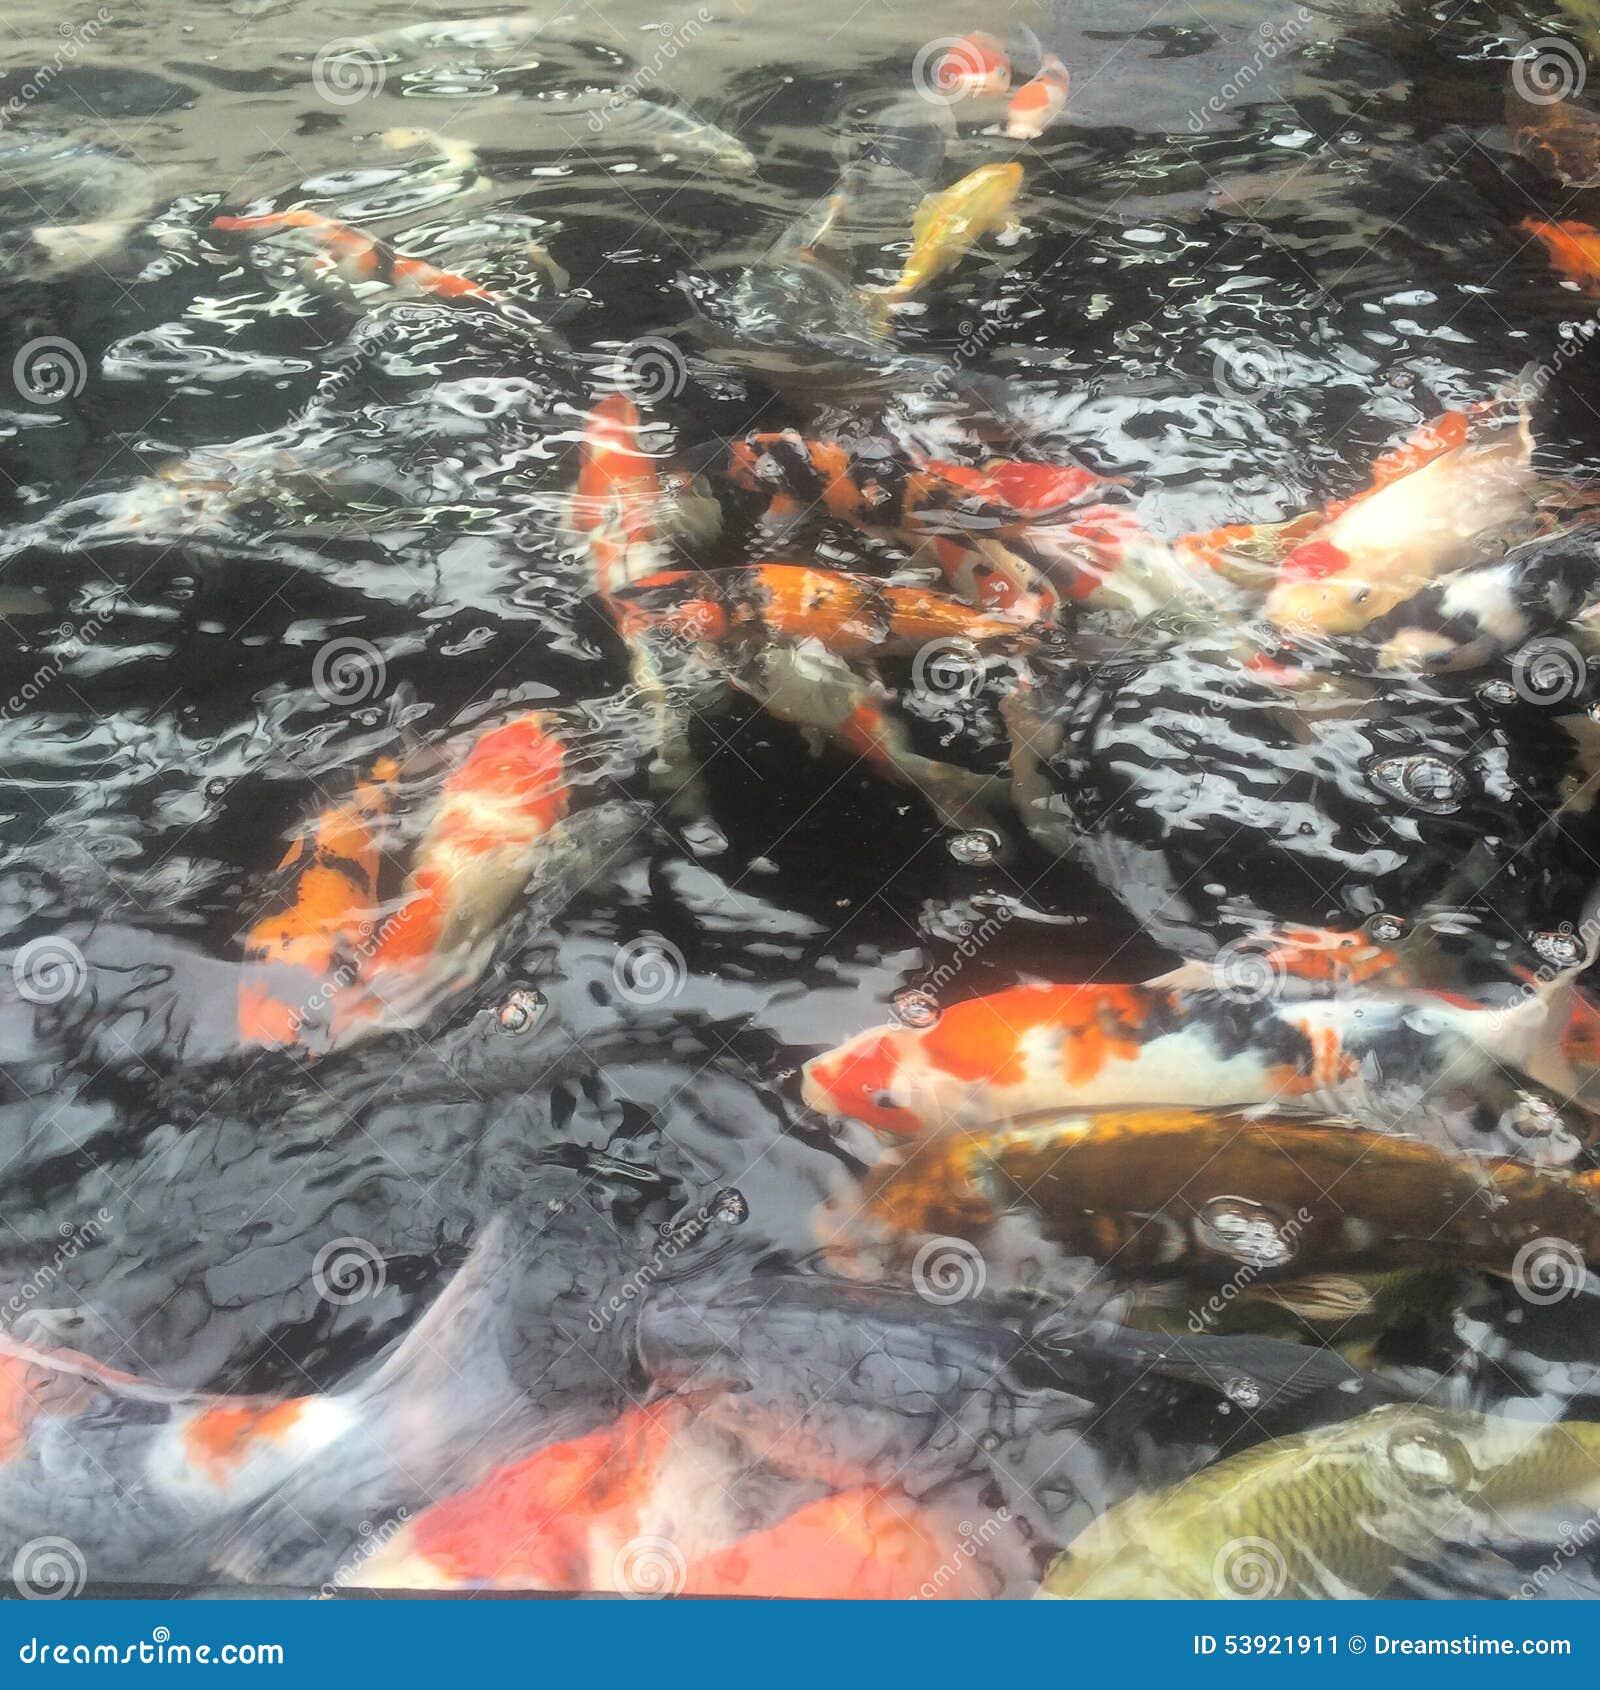 Koi Carp Stock Photo Image 53921911